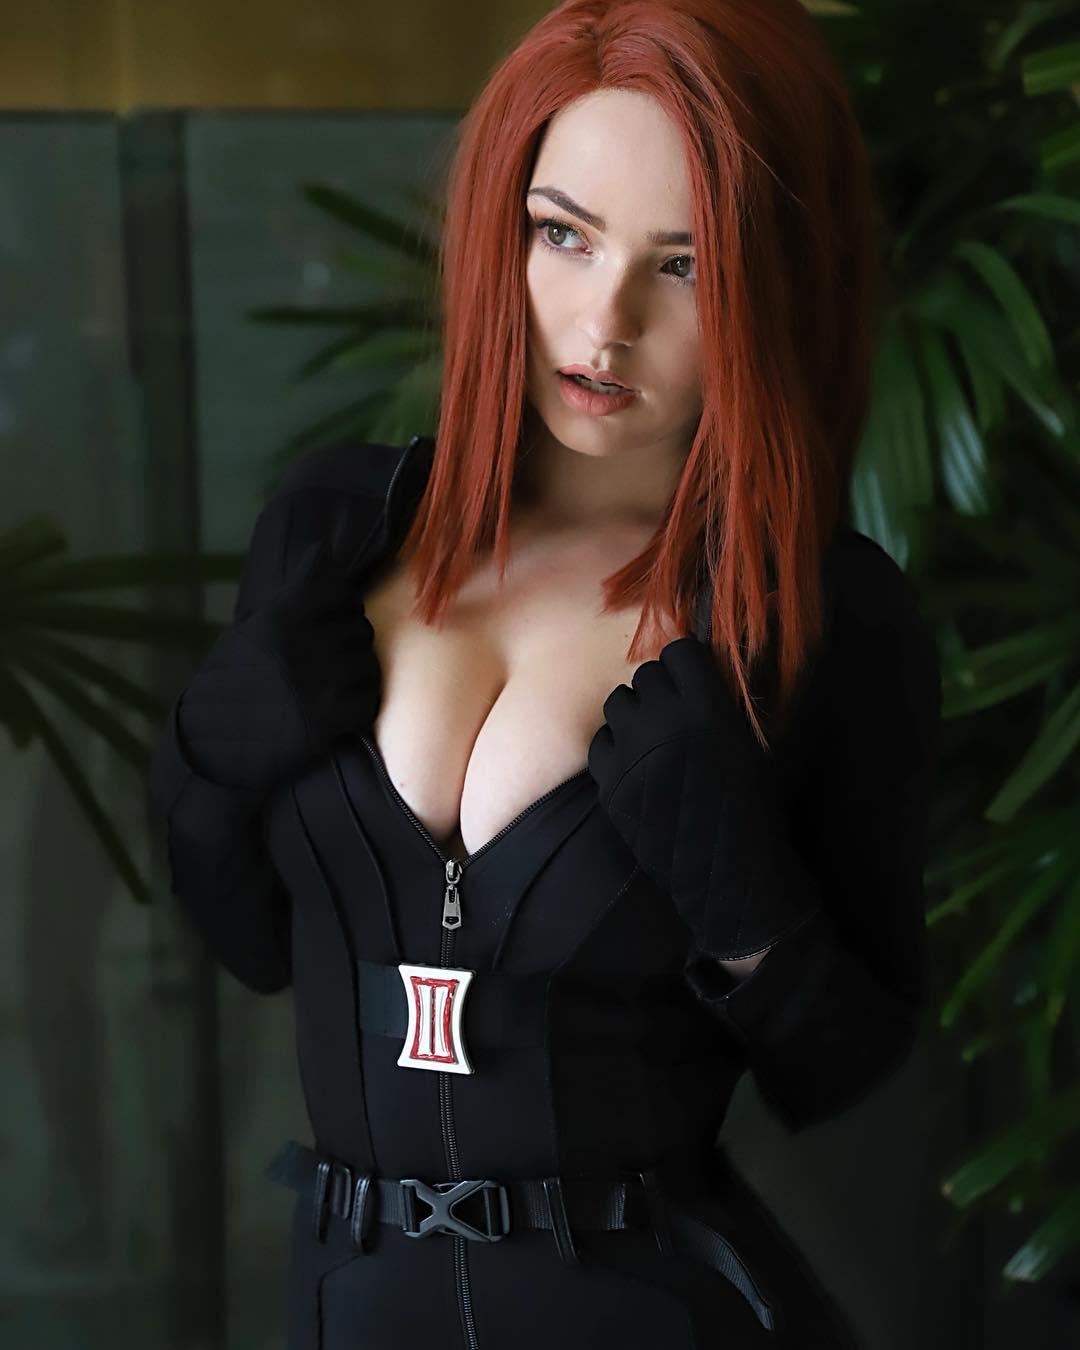 denver-softcore-widow-girl-xlxx